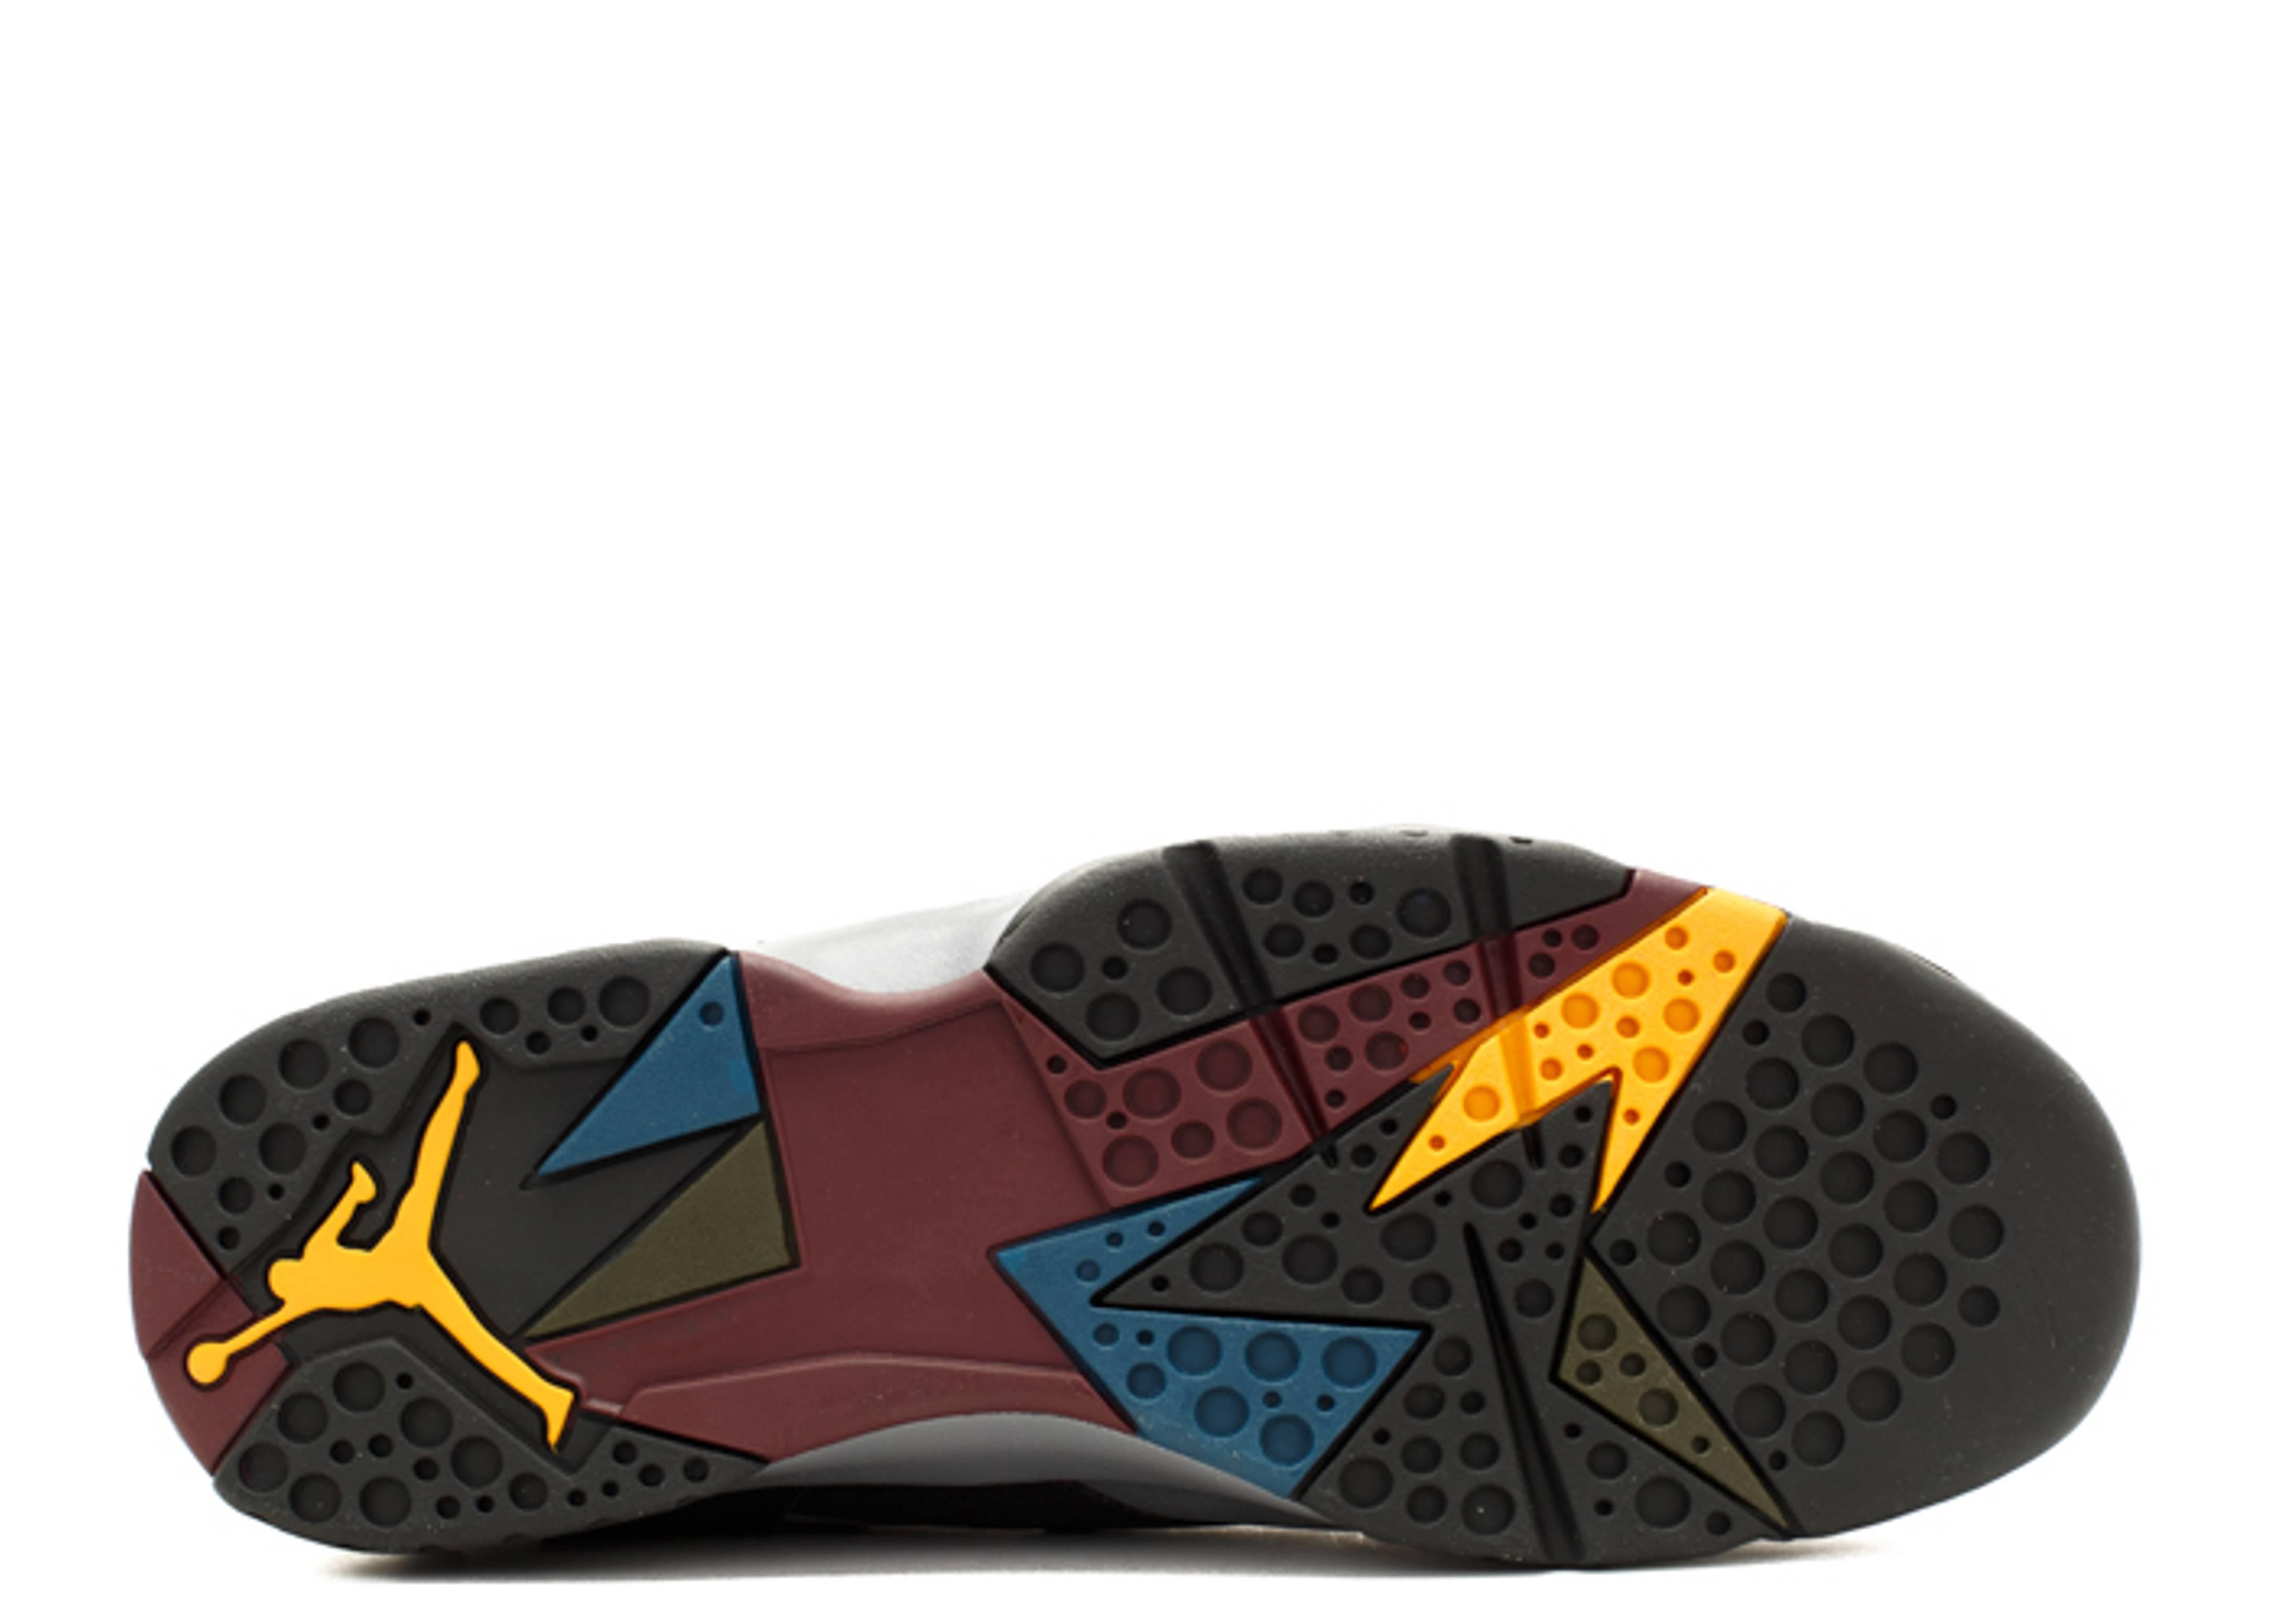 4704e848bd7 Air Jordan 7 Retro